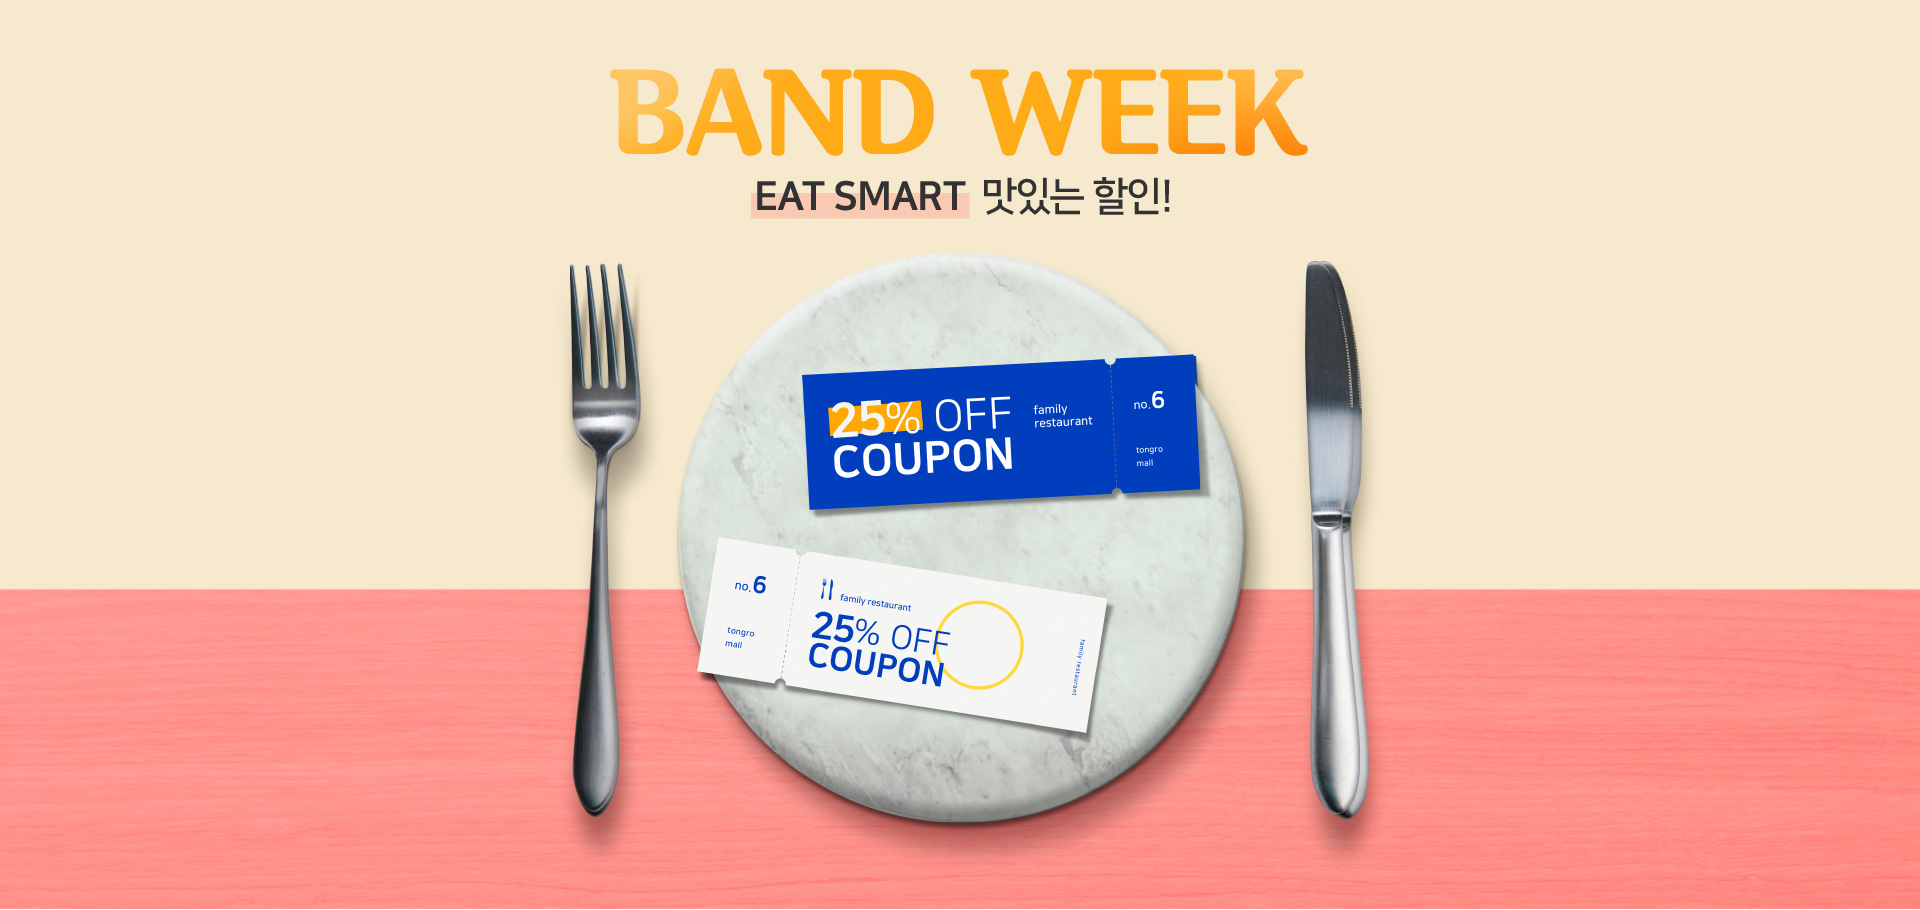 BAND WEEK EAT SMART 맛있는 할인 장바구니 쿠폰 25% 2만원 이상 구매 시 / 최대 2만원 항인 쿠폰 다운로드